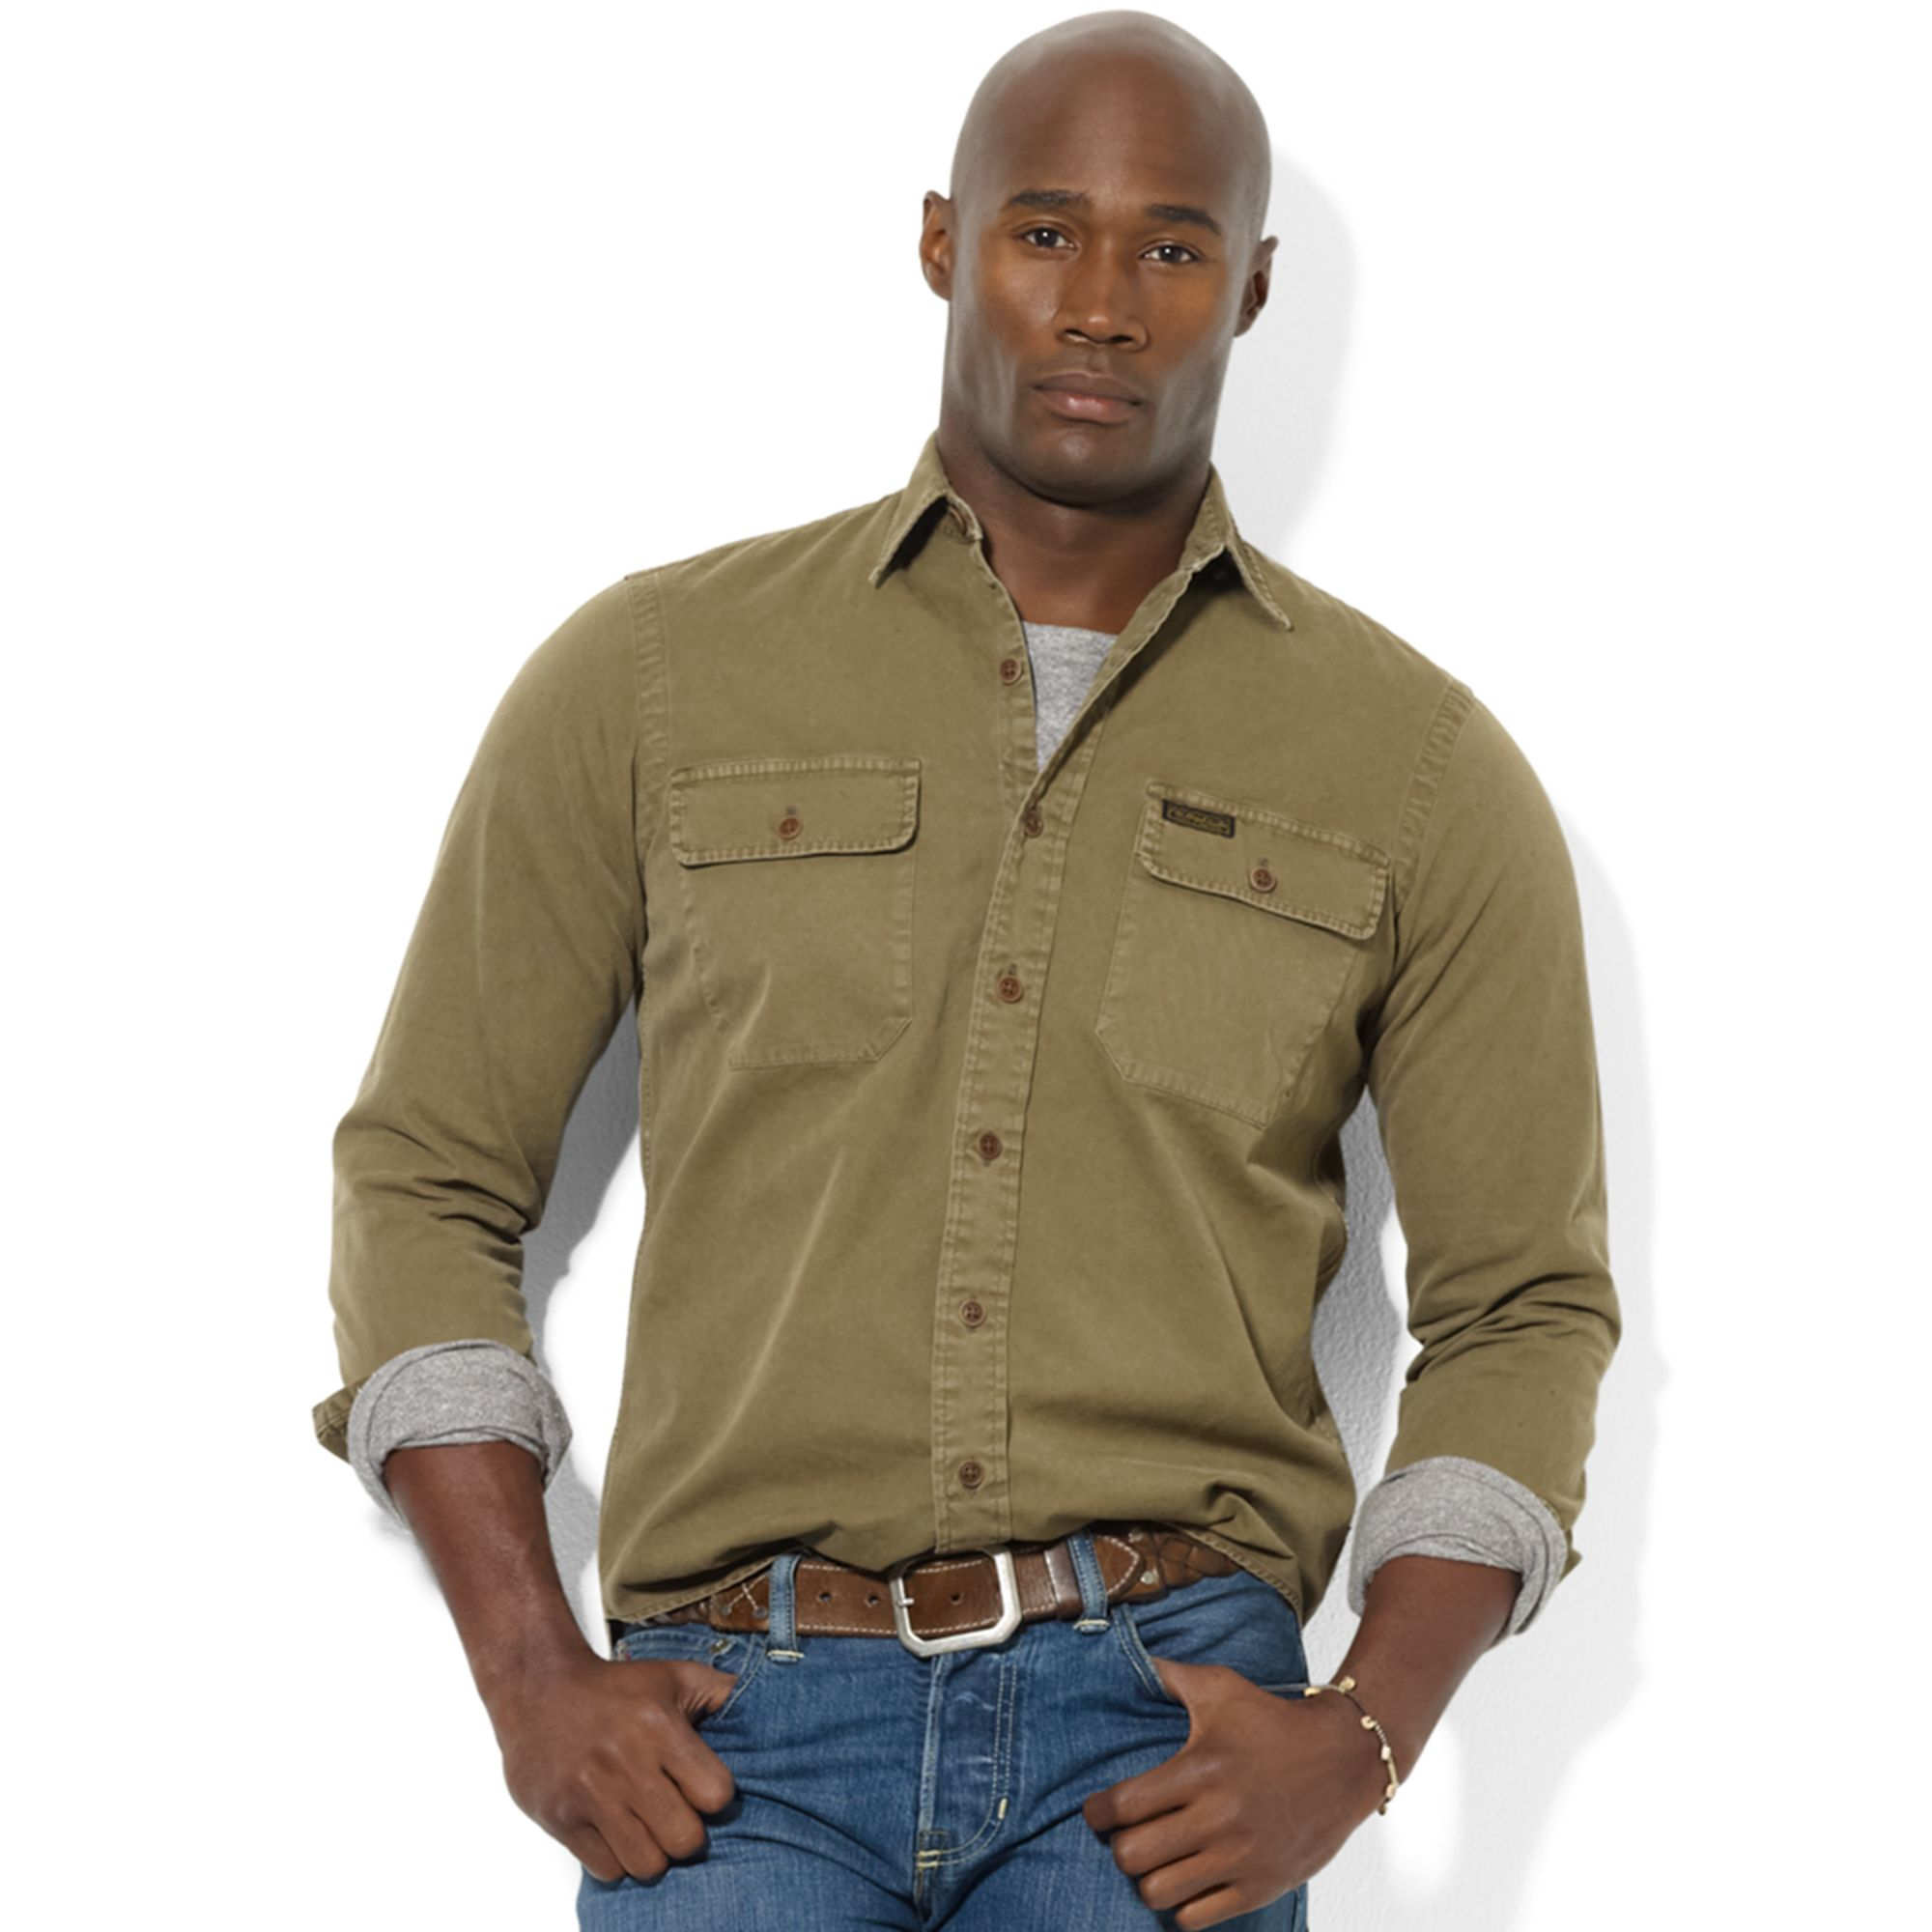 Marein Polo Ralph Lauren Shirt Cotton Twill Military Work Shirt